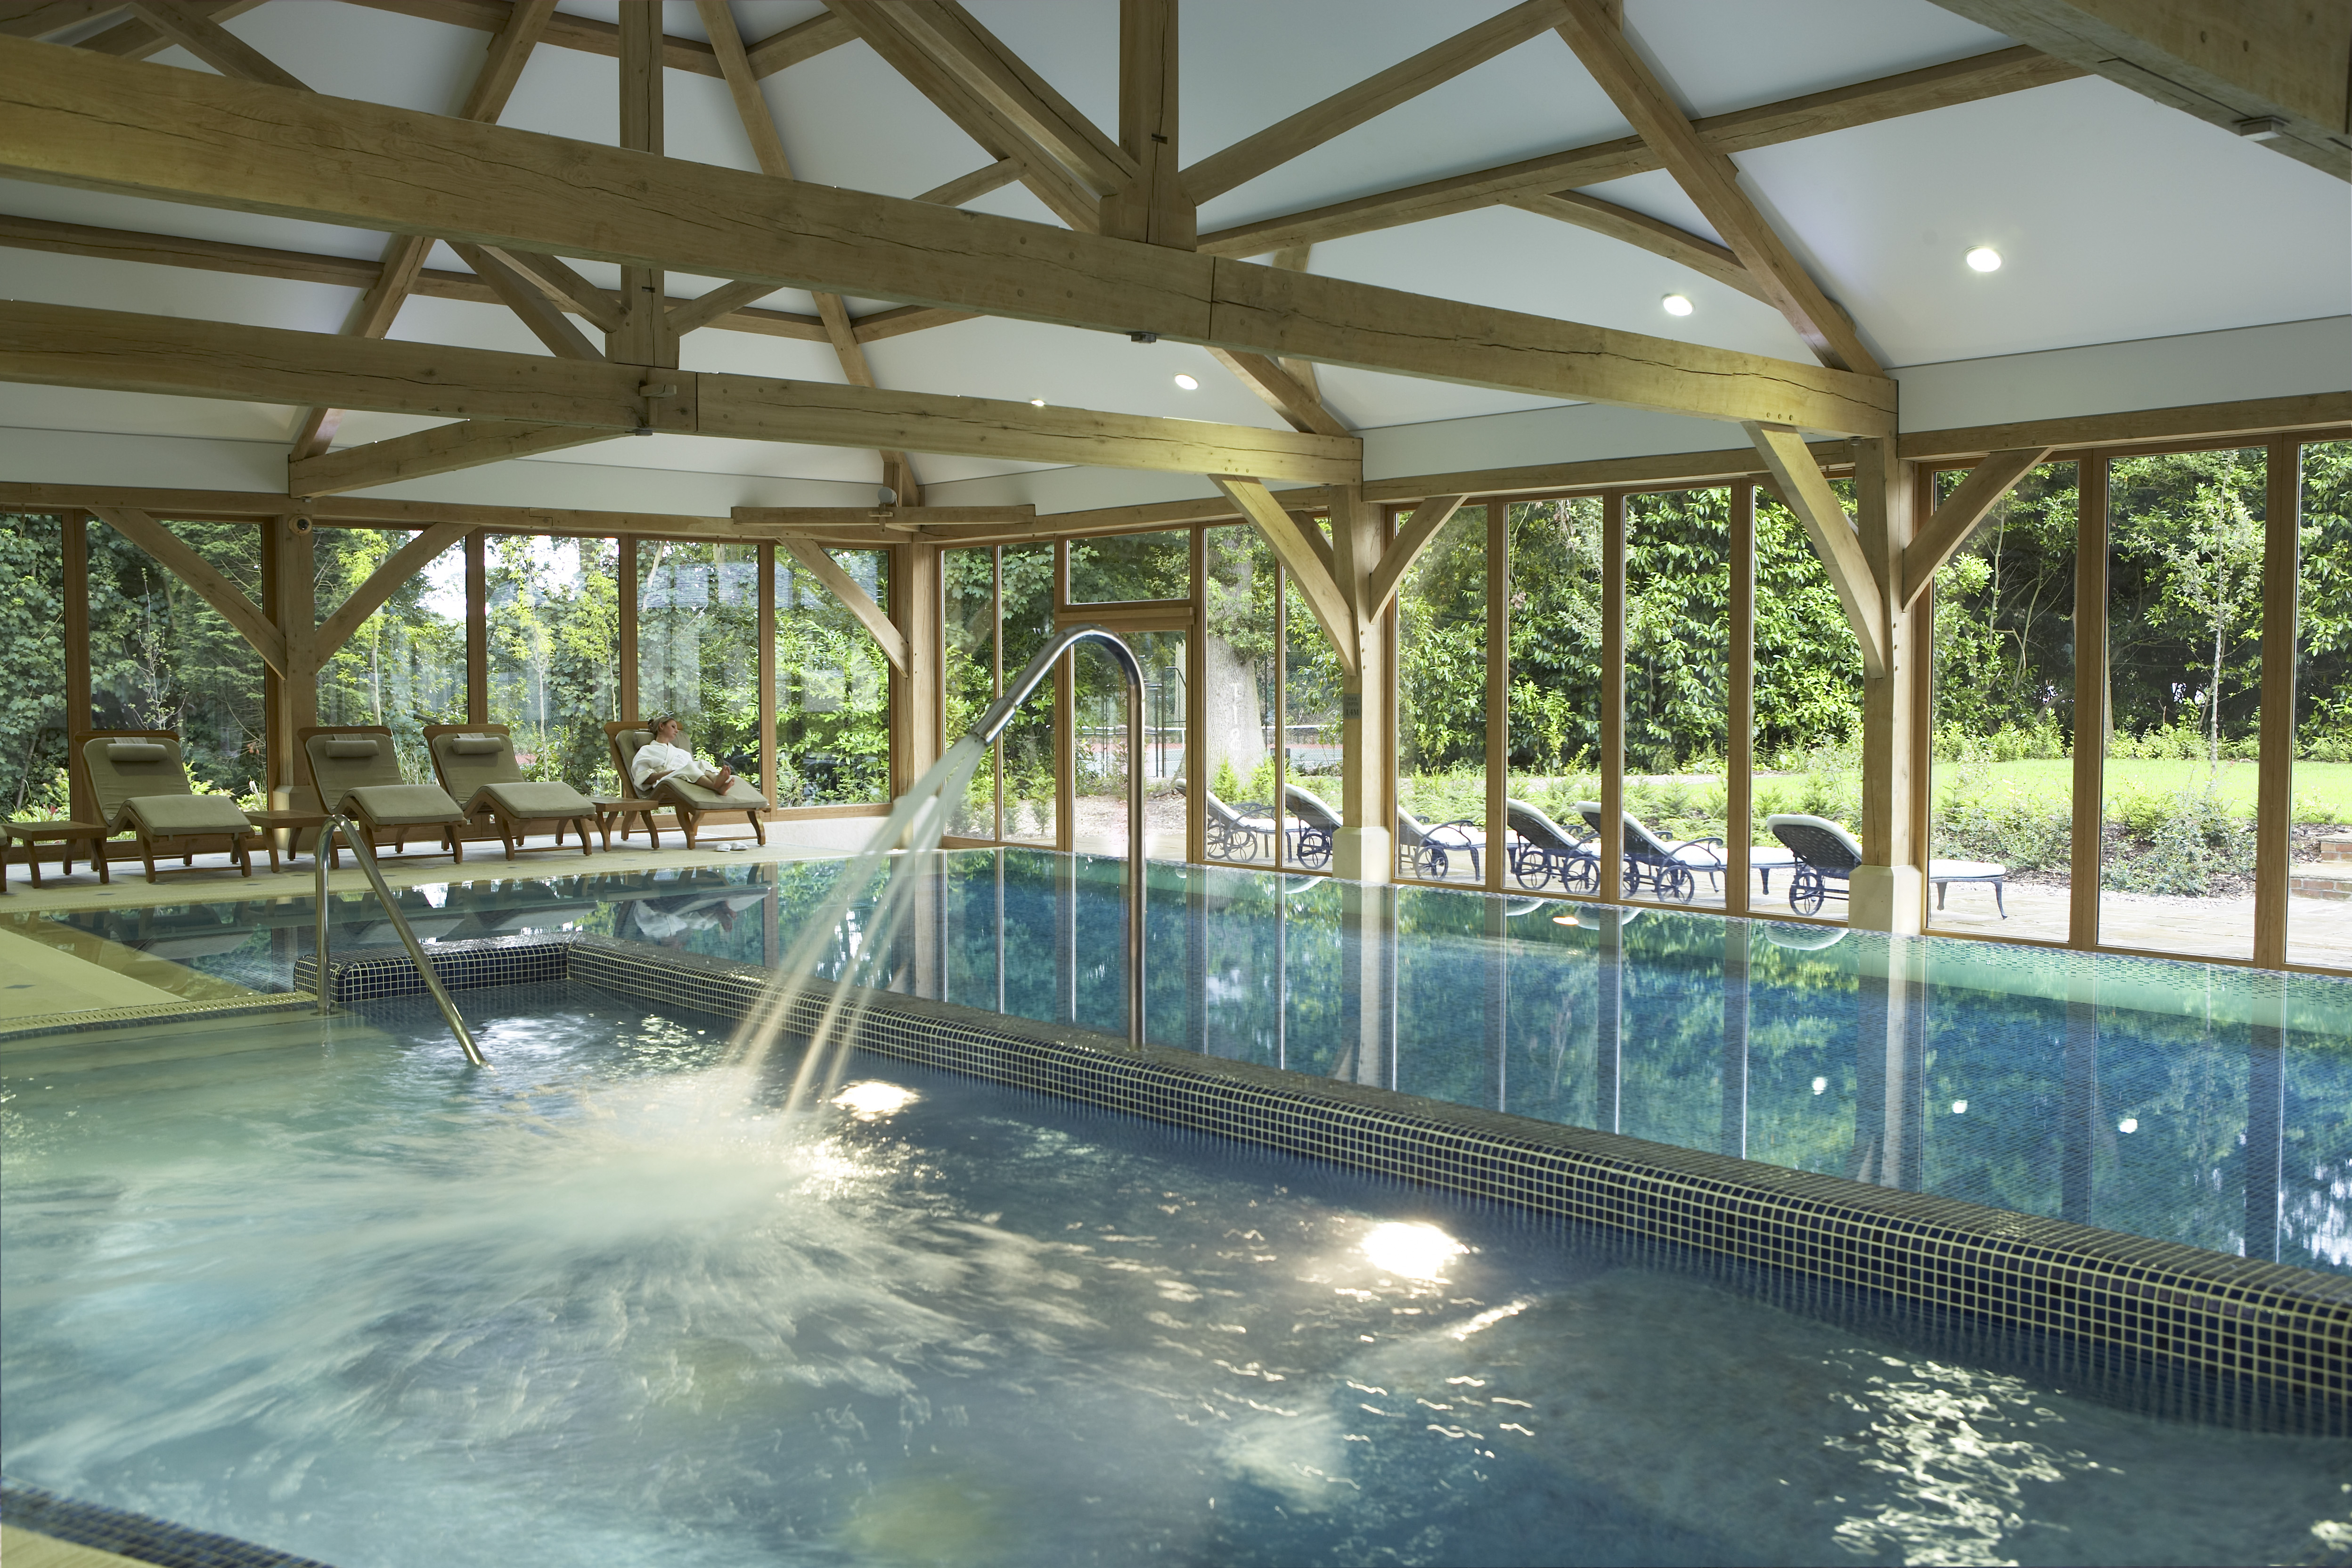 Luton Hoo Hotel Spa